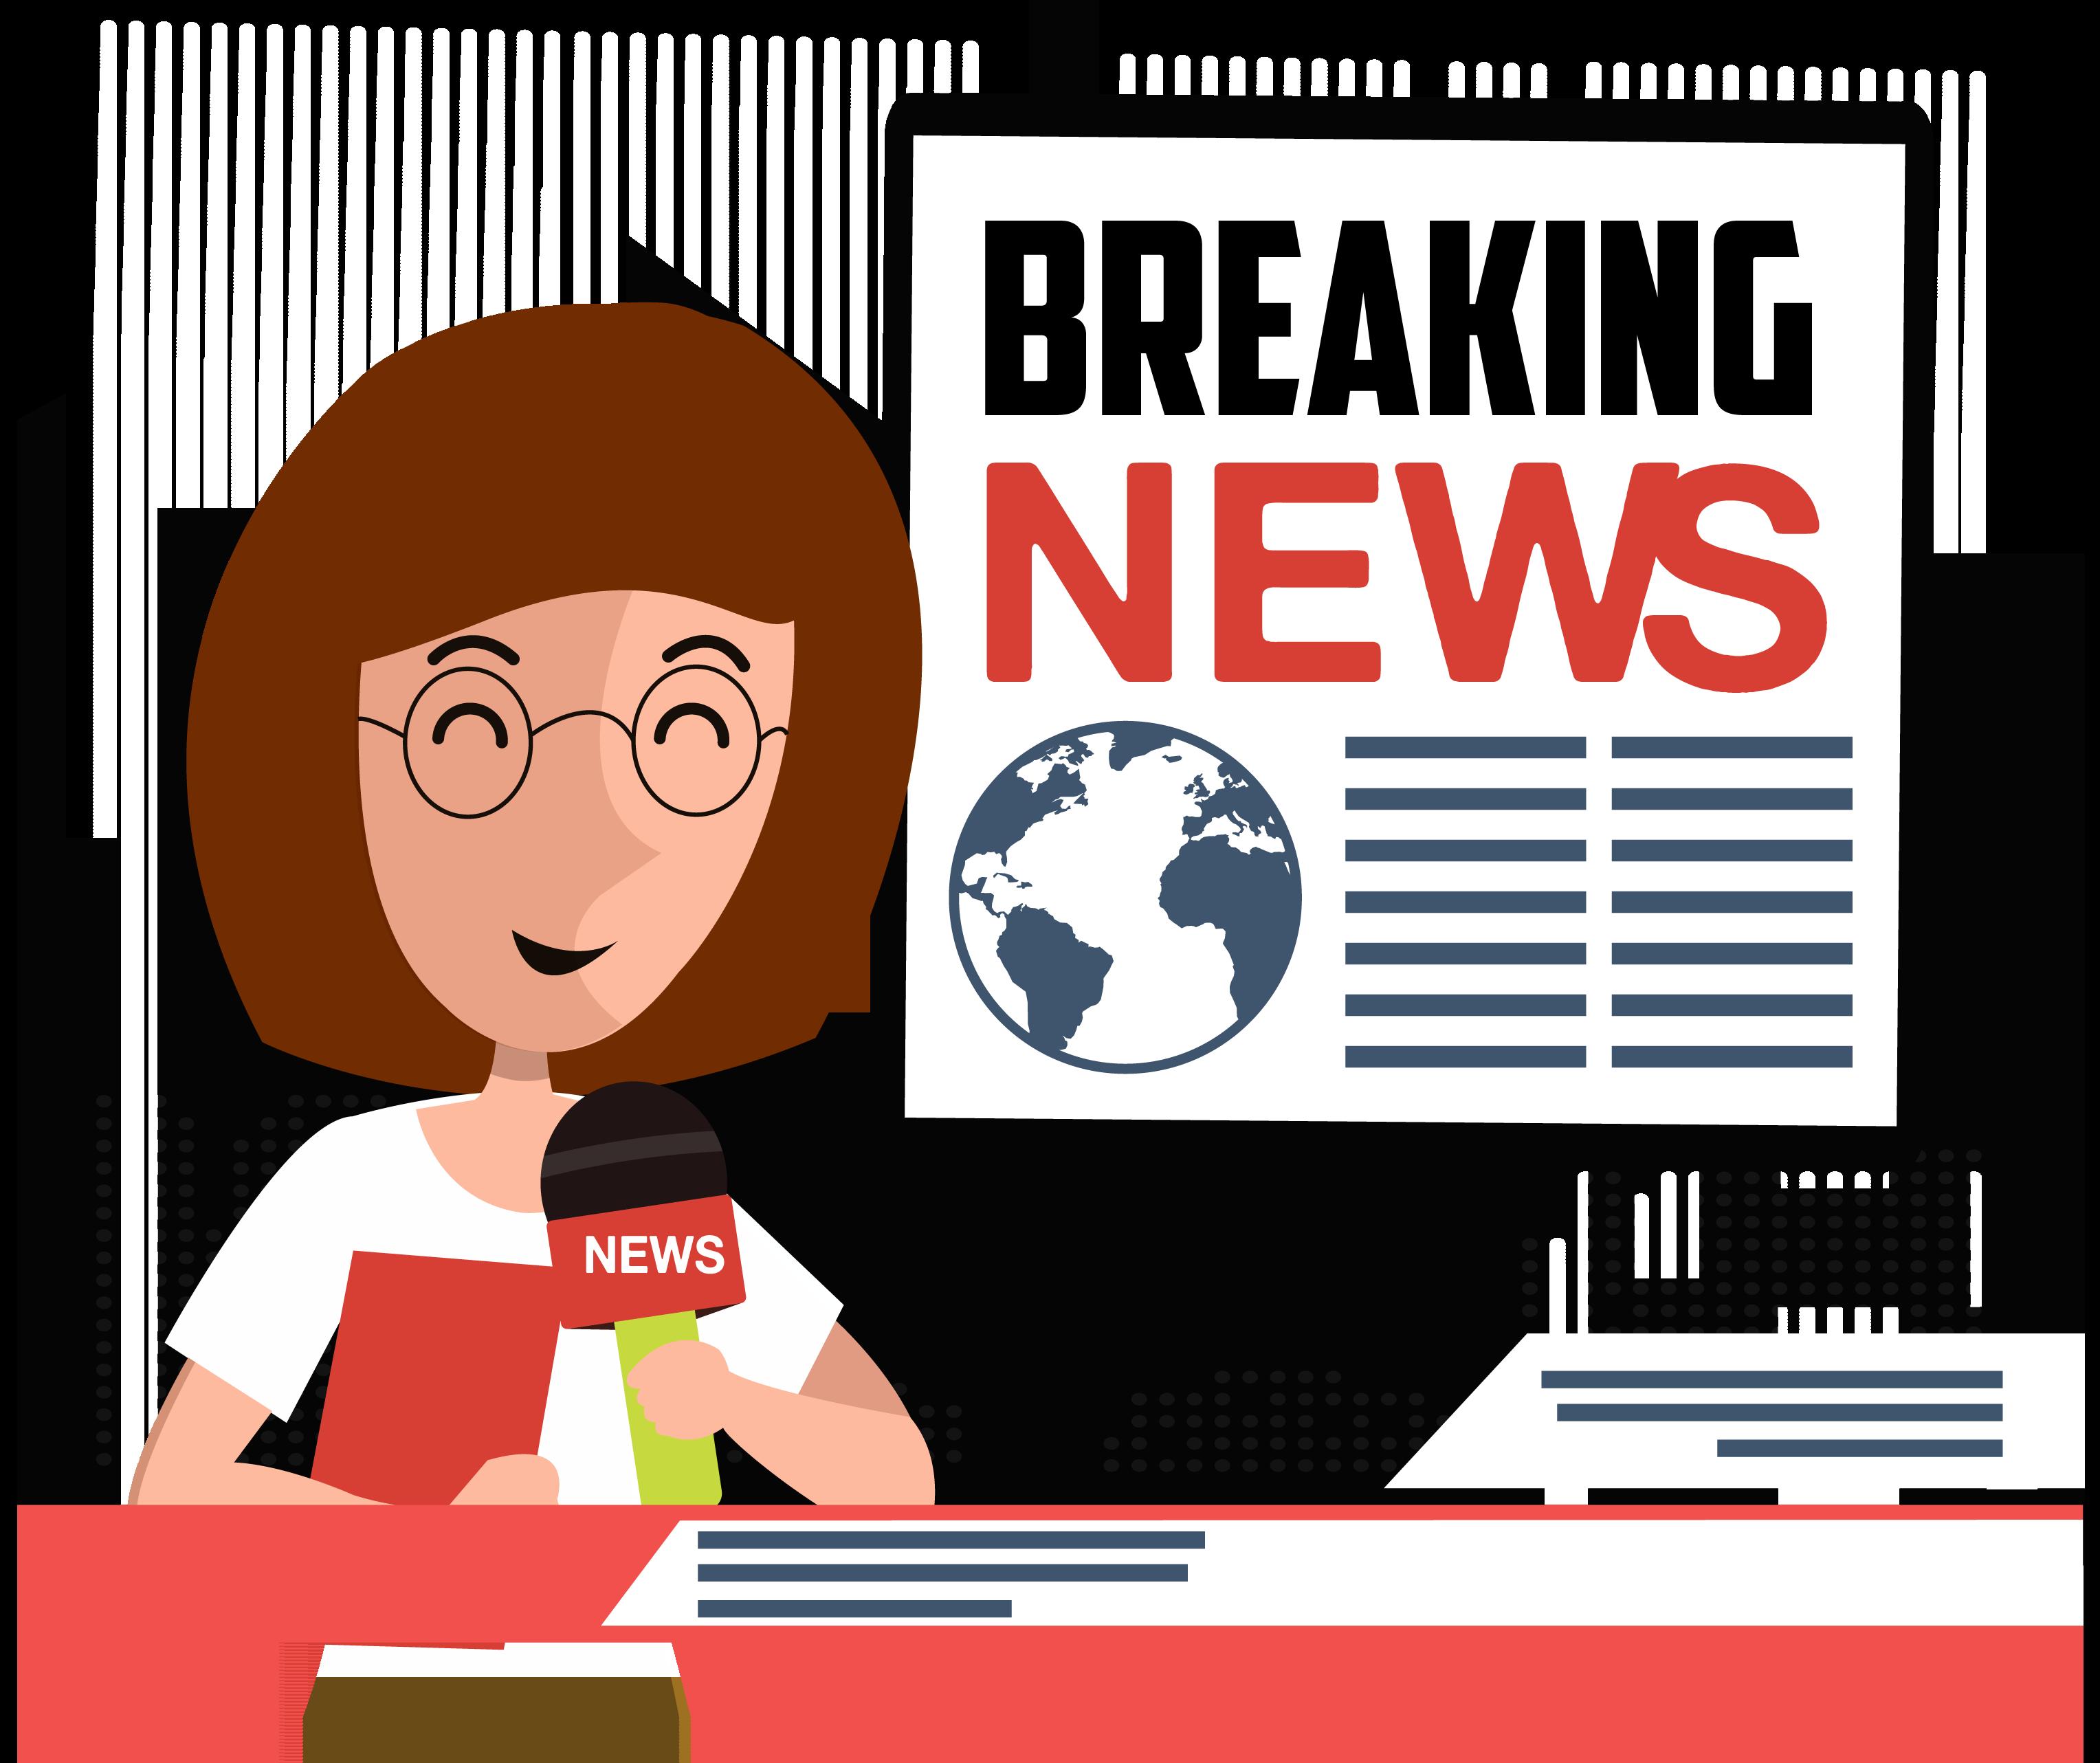 news-clipart-news-anchor-4